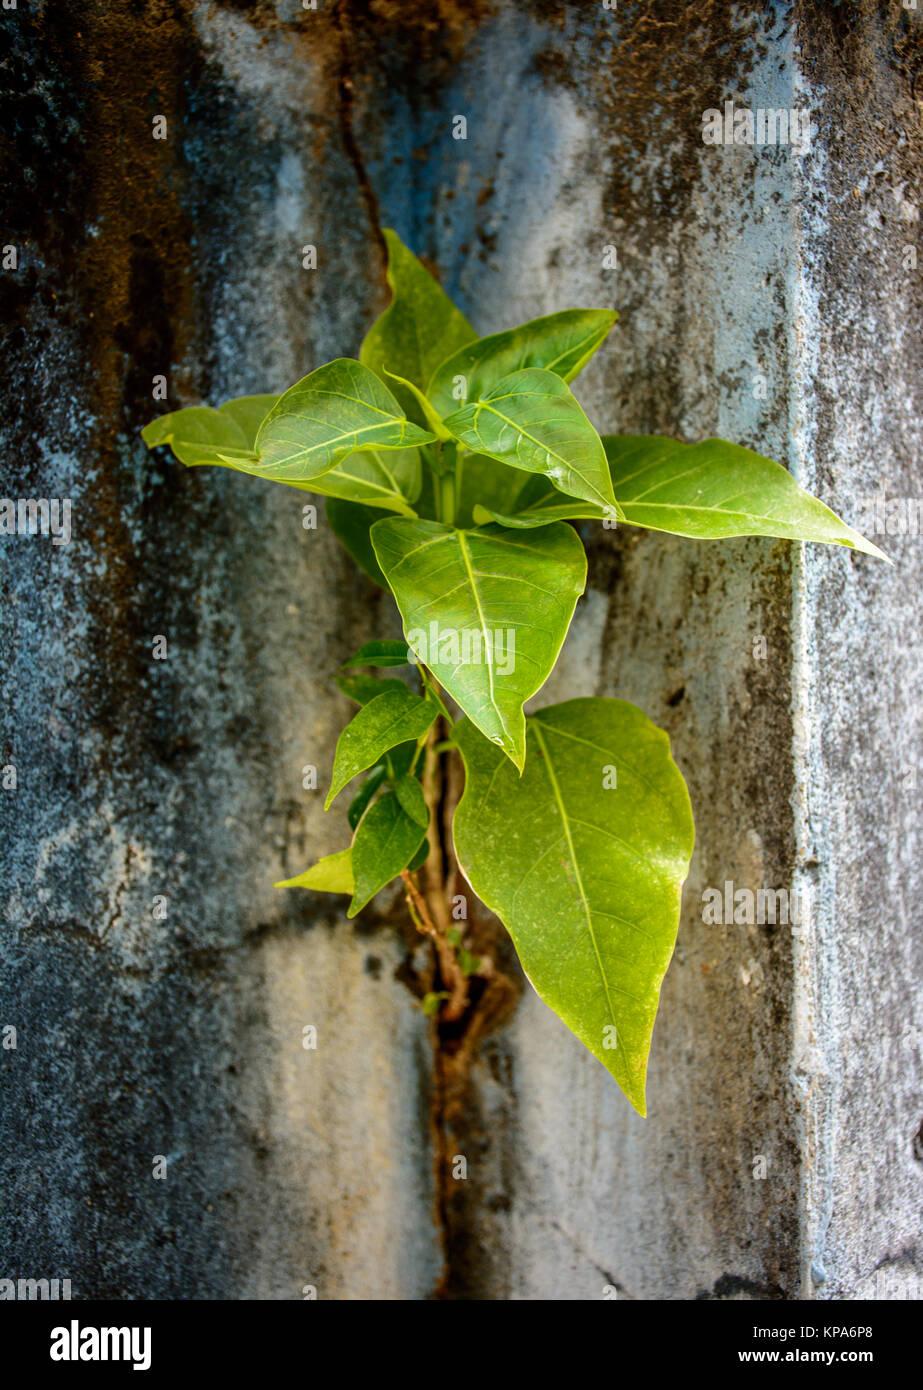 small banyan tree stock photos small banyan tree stock images alamy